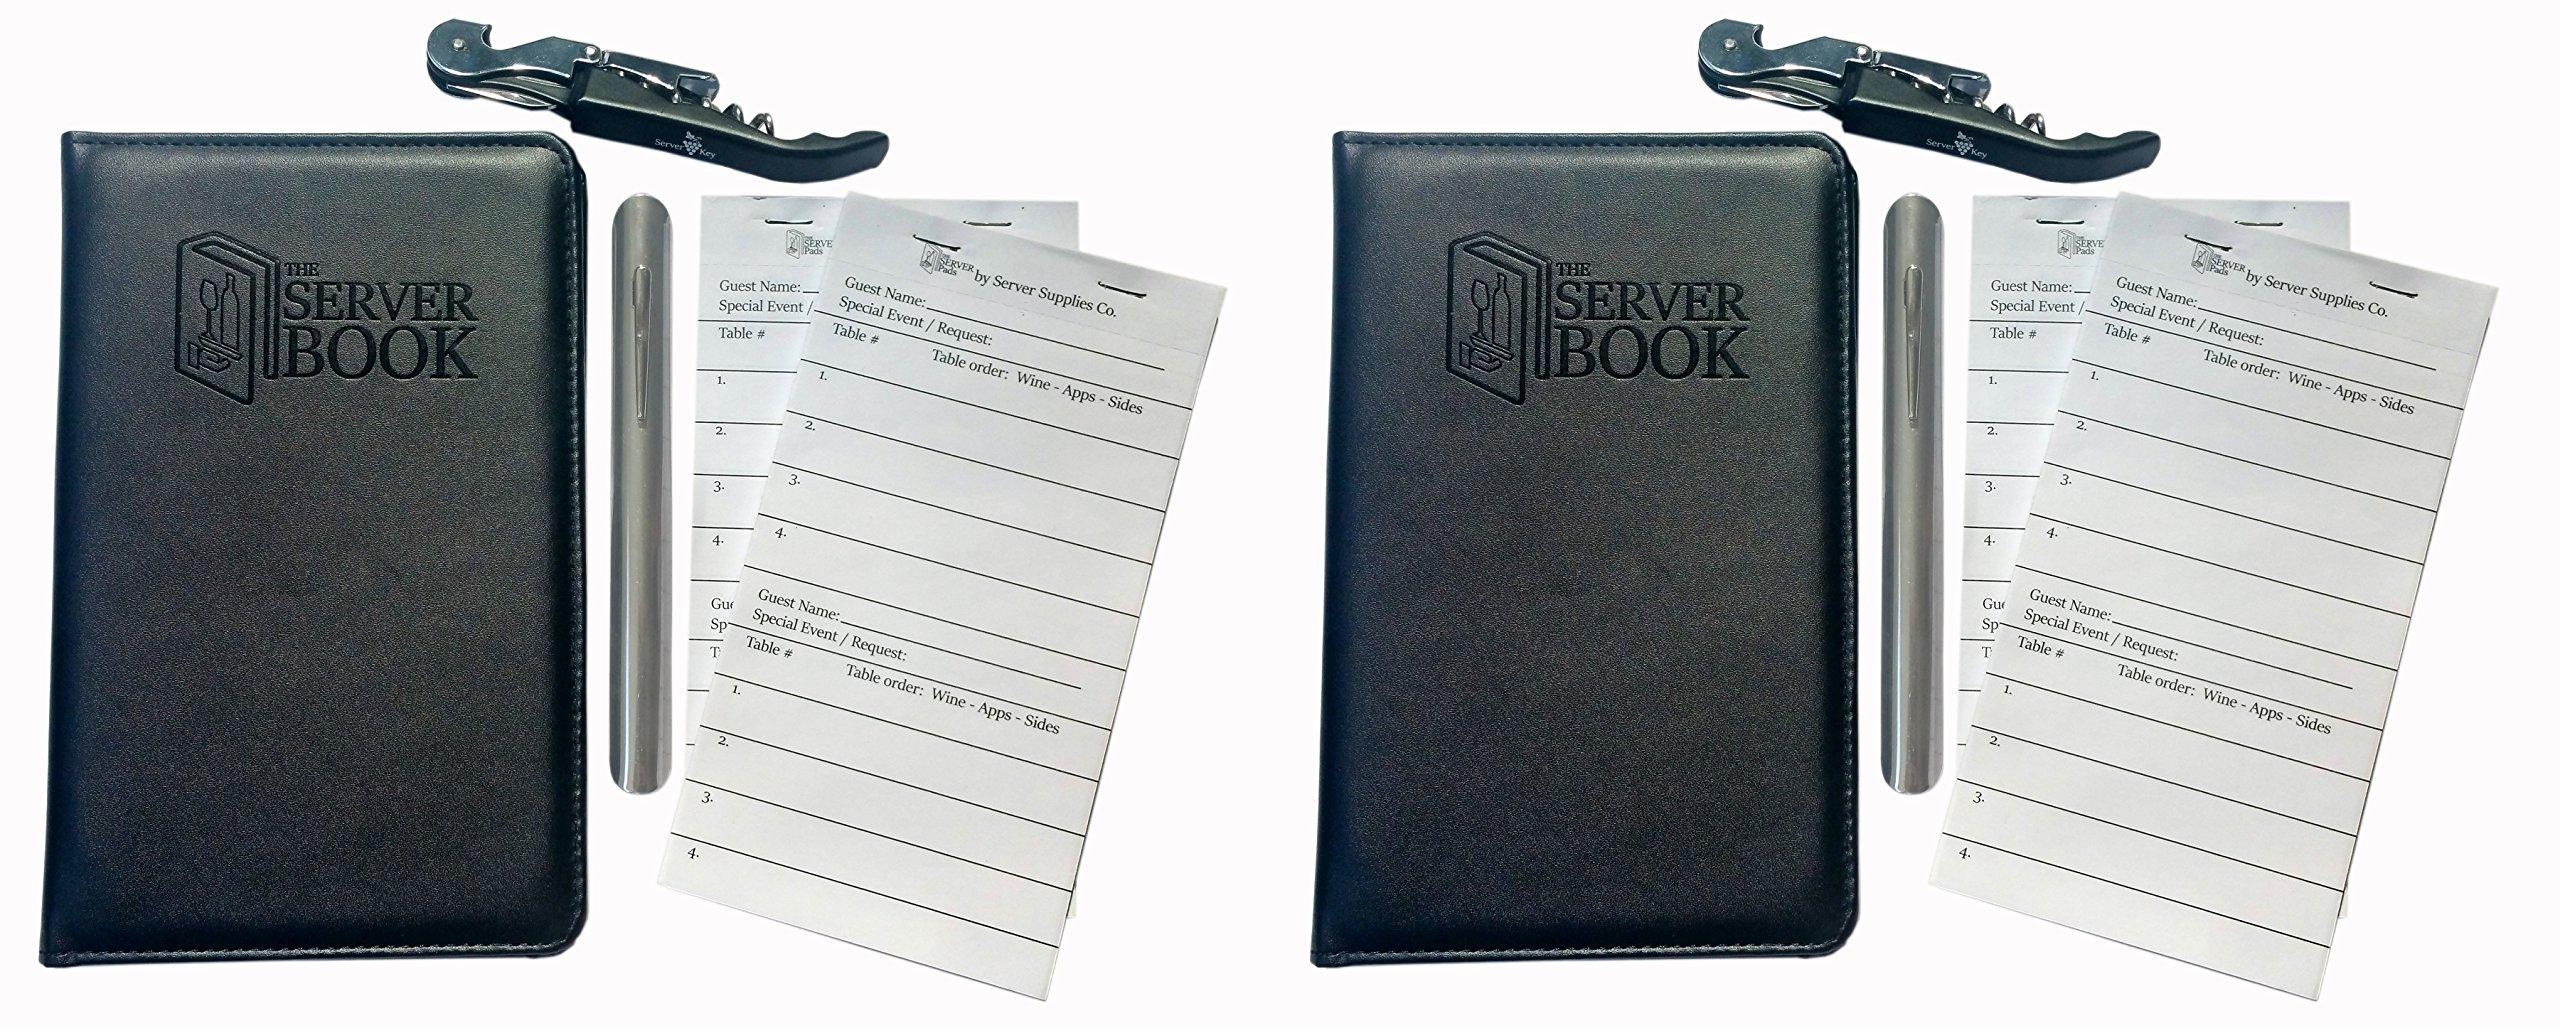 2 Server Book with Zipper Pocket - 2 Wine Keys - 2 Stainless Steel Crumbers - 4 Server Pads - Black Waitress/Waiter Book - Food Service Equipment & Supplies - Menu & Check Displayers (2)